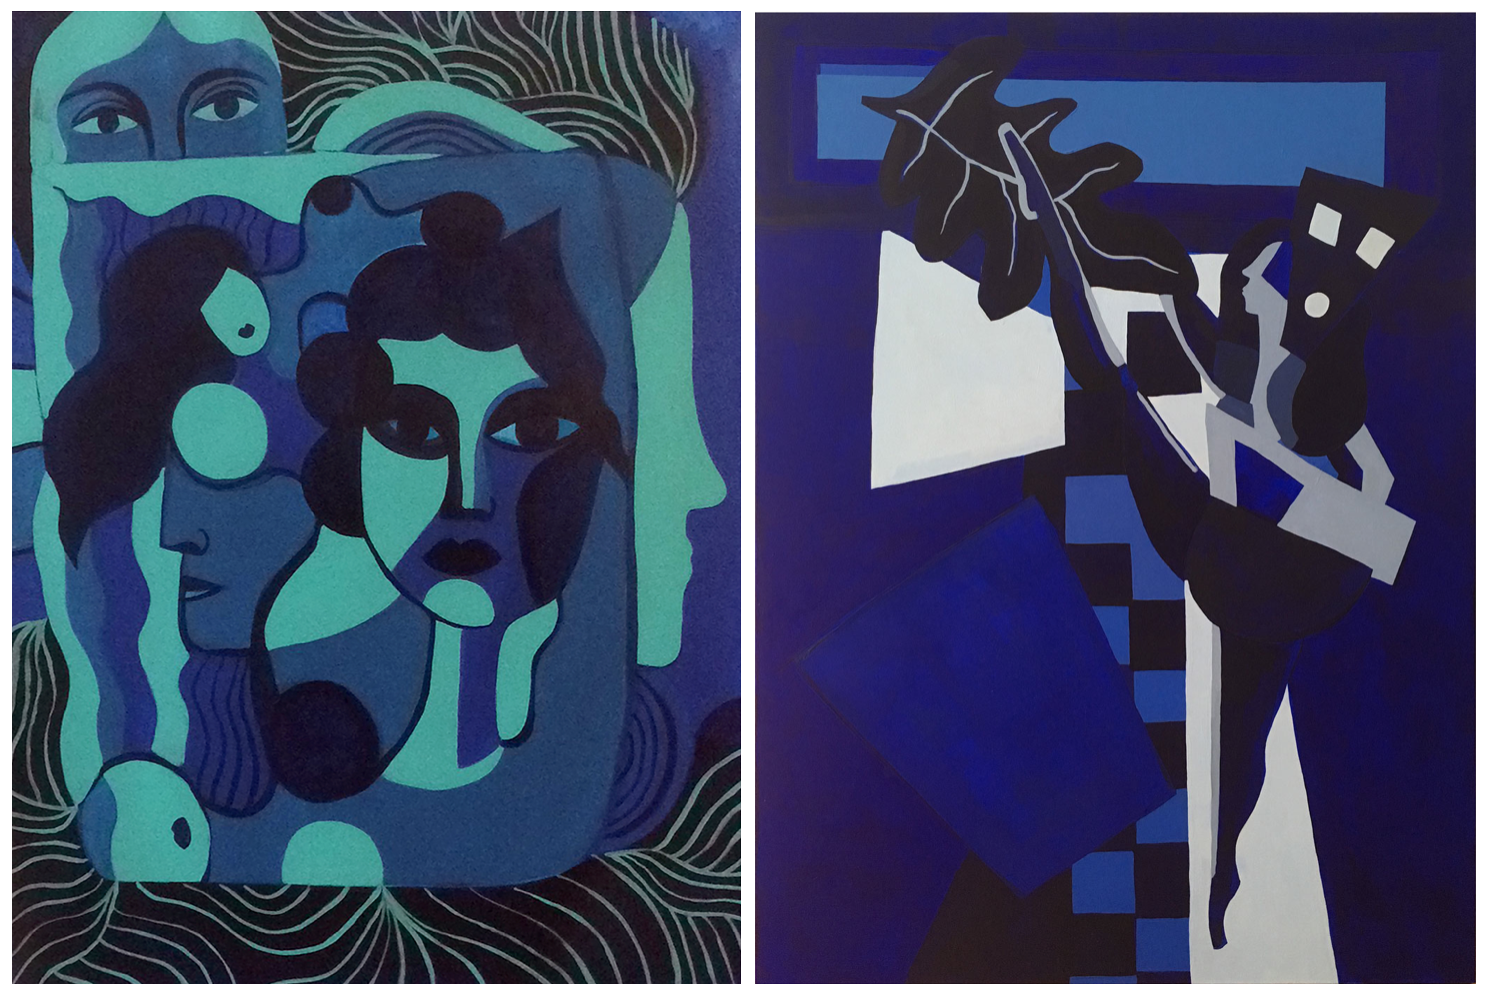 L:  Hanna Barczyk,  Blue Romance , 2018, acrylic on canvas, 47 x 35 inches  (inquire)   R:  Franziska Barczyk,  Opportunity , 2018, acrylic on canvas, 48 x 36 inches  (inquire)